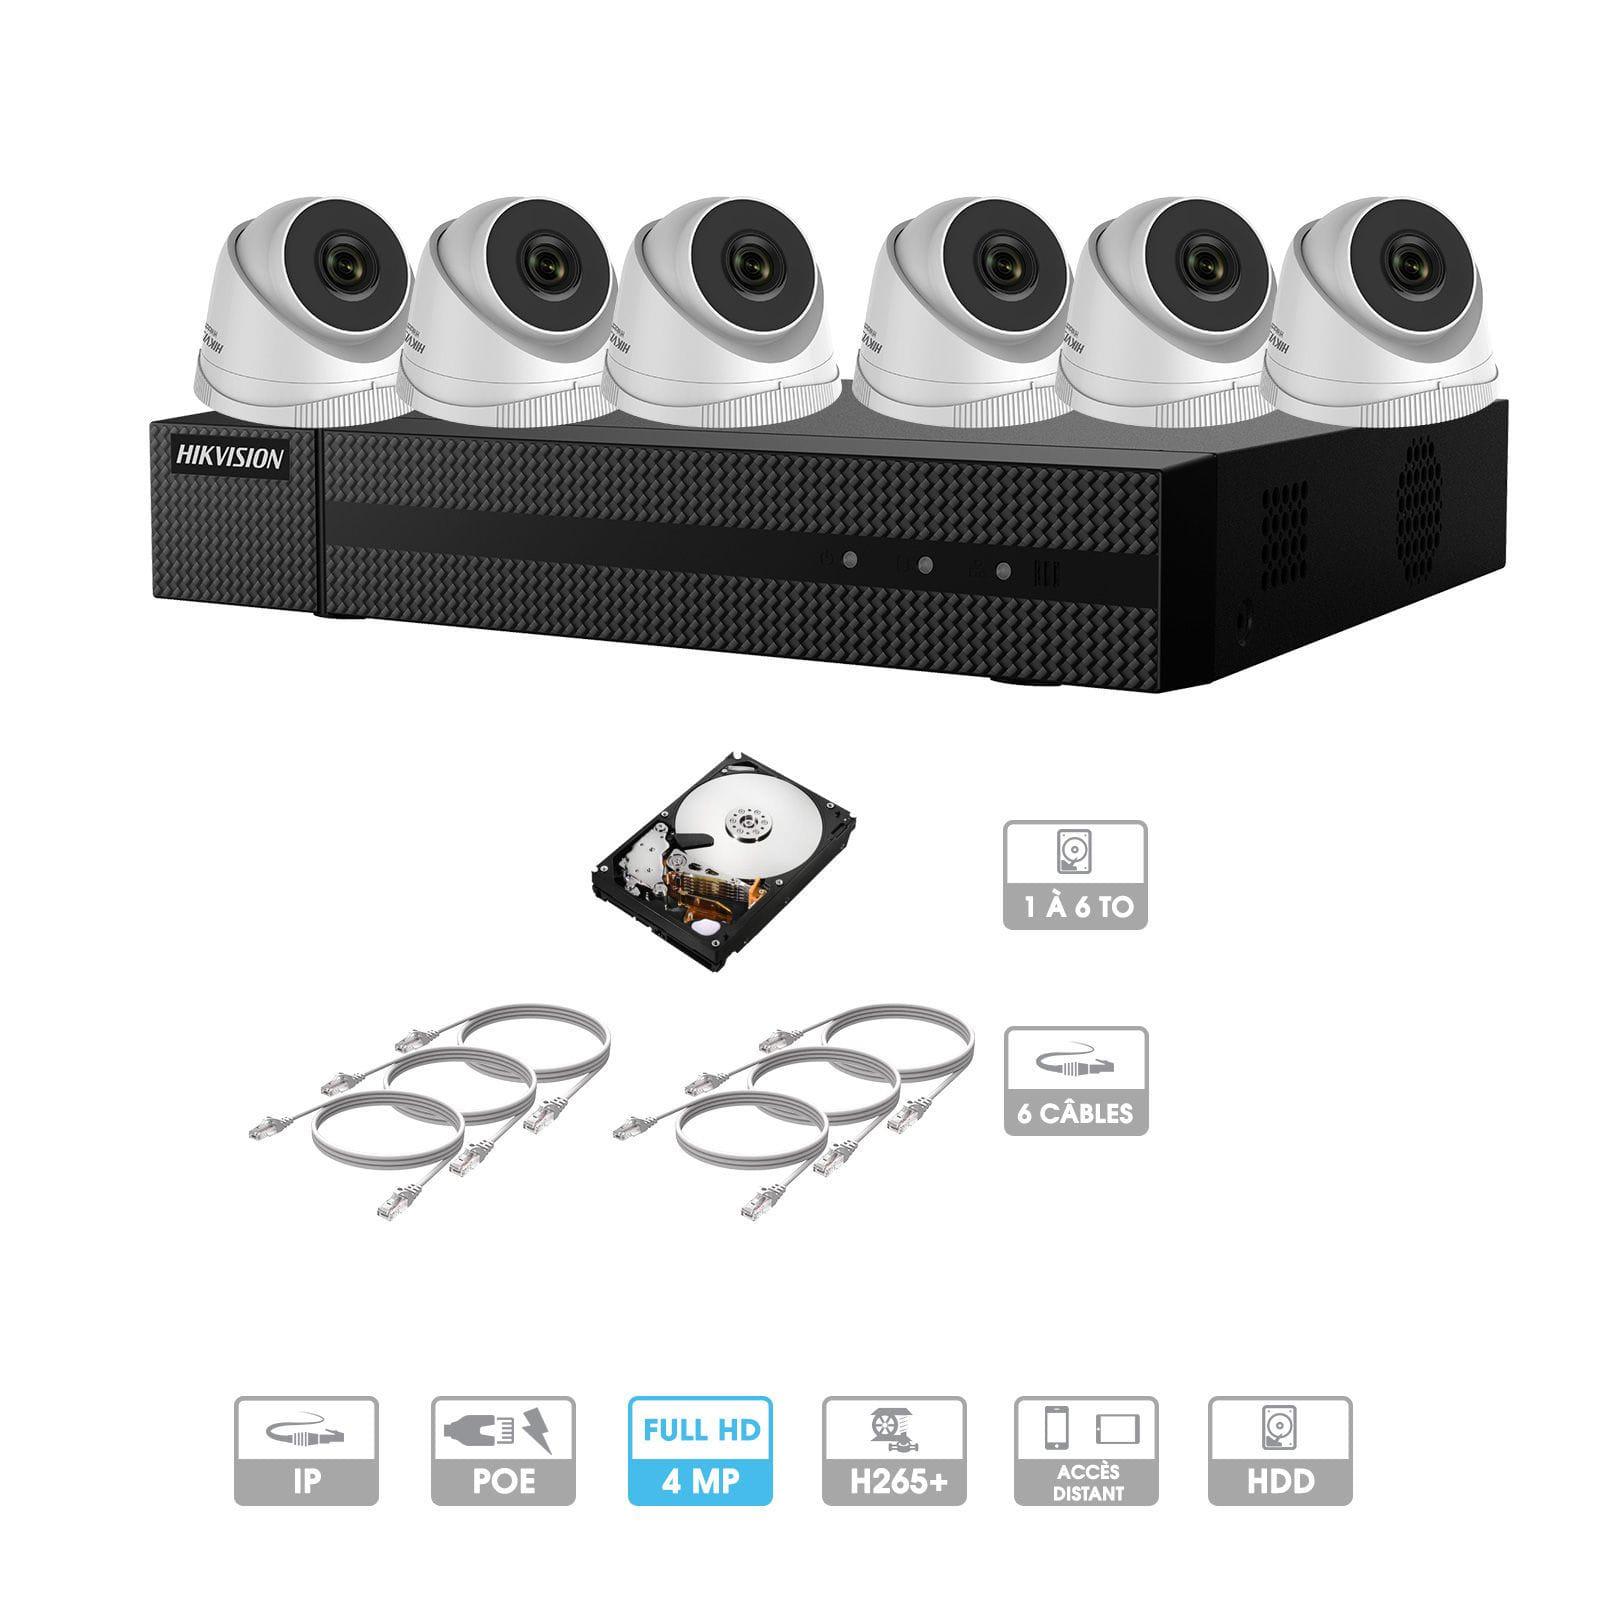 Kit vidéosurveillance 6 caméras | 4 MP | IP PoE | 6 câbles RJ45 20/30/40/50 mètres | HDD 1 à 6 To | Dôme Hiwatch